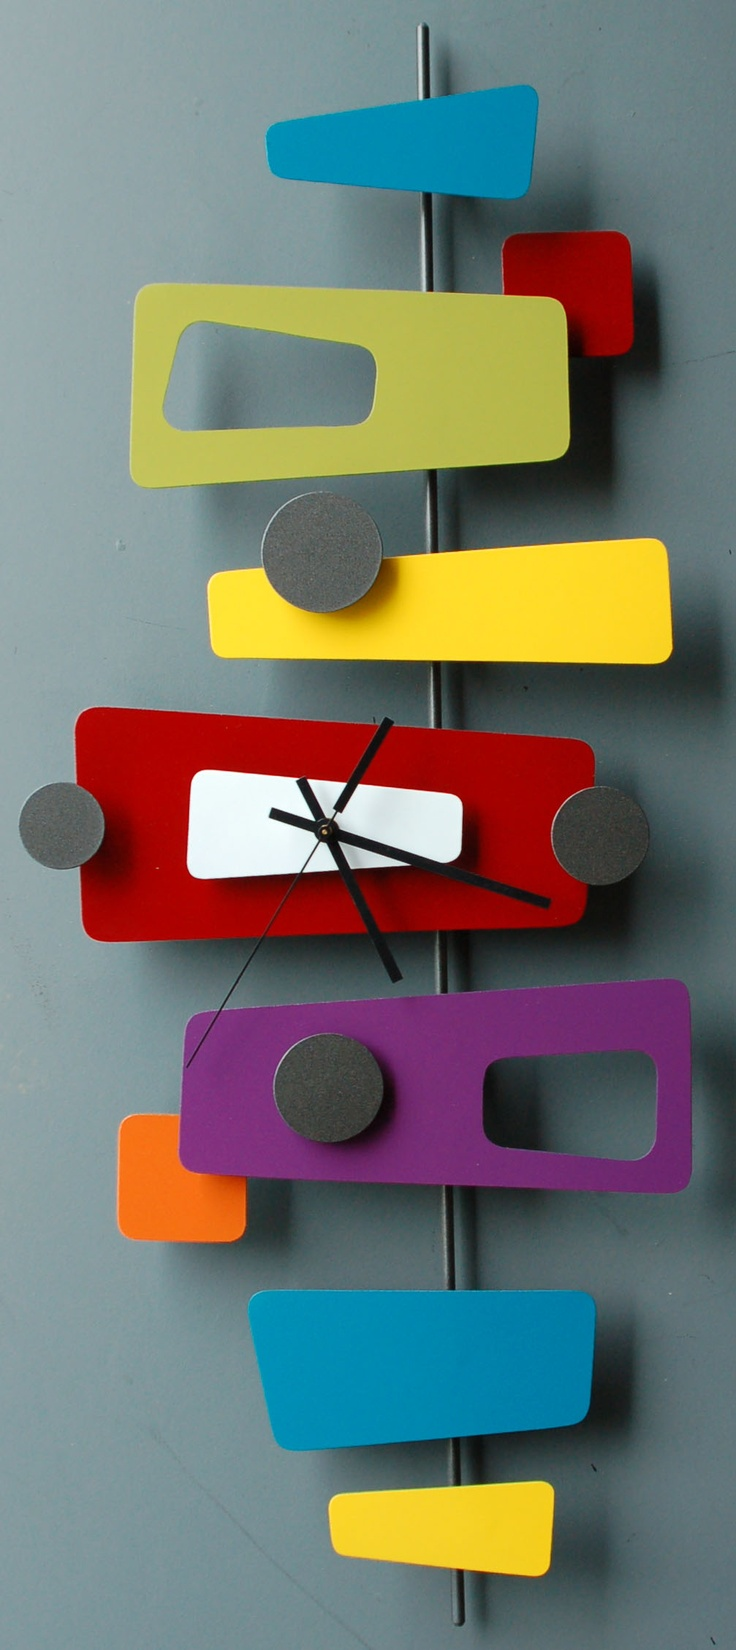 Googie-inspired modern retro metal art sculpture clocks by Steve Cambronne